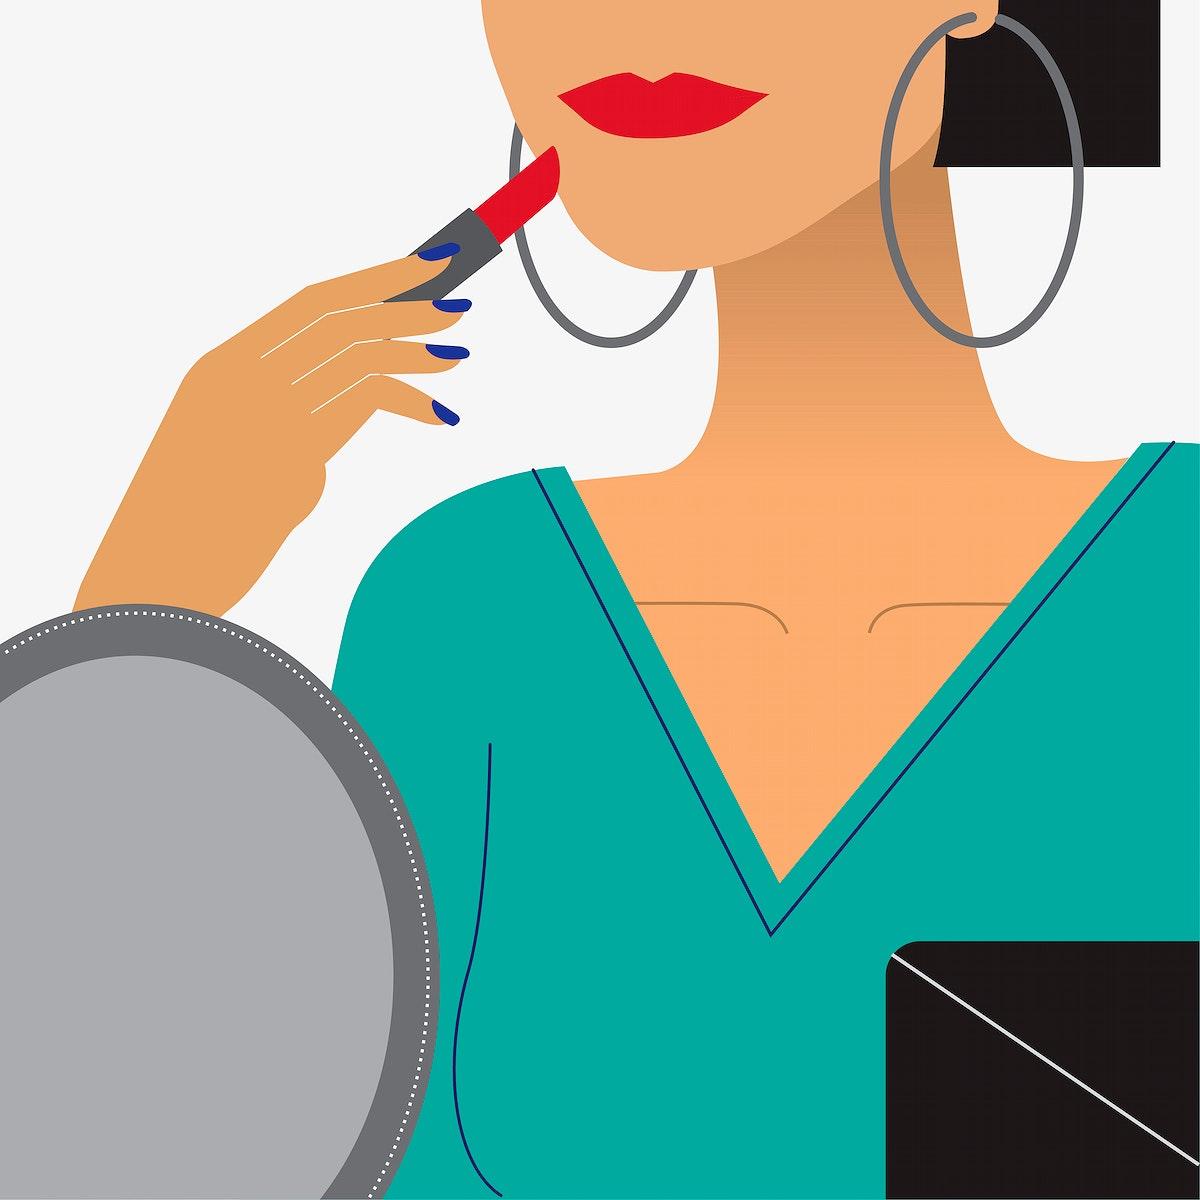 Woman putting on red lipstick illustration